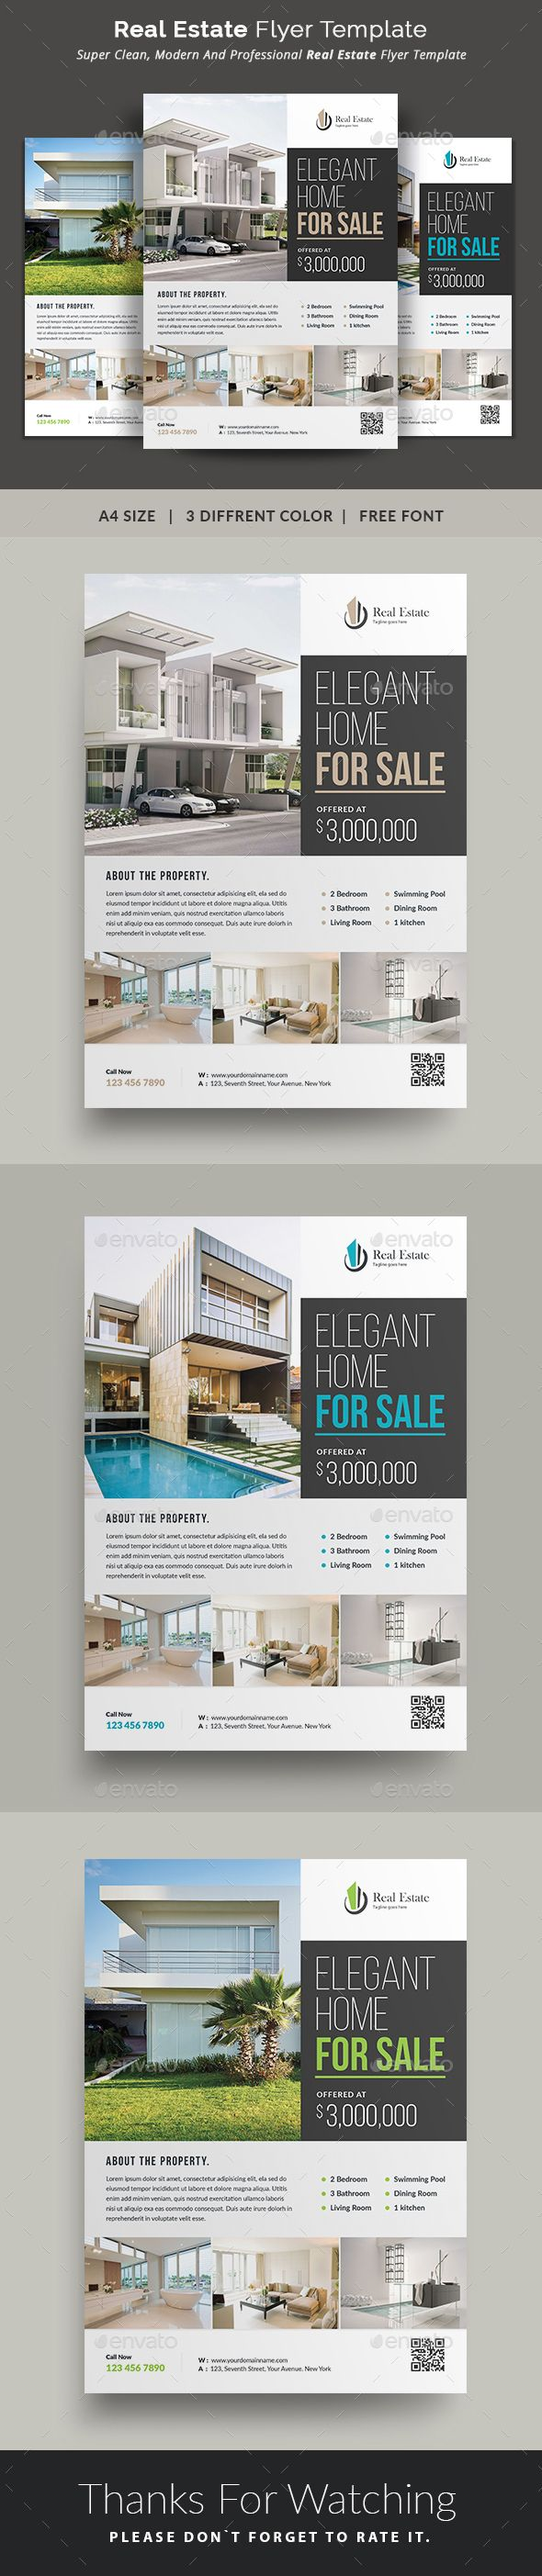 Real Estate Flyer Commerce Flyers